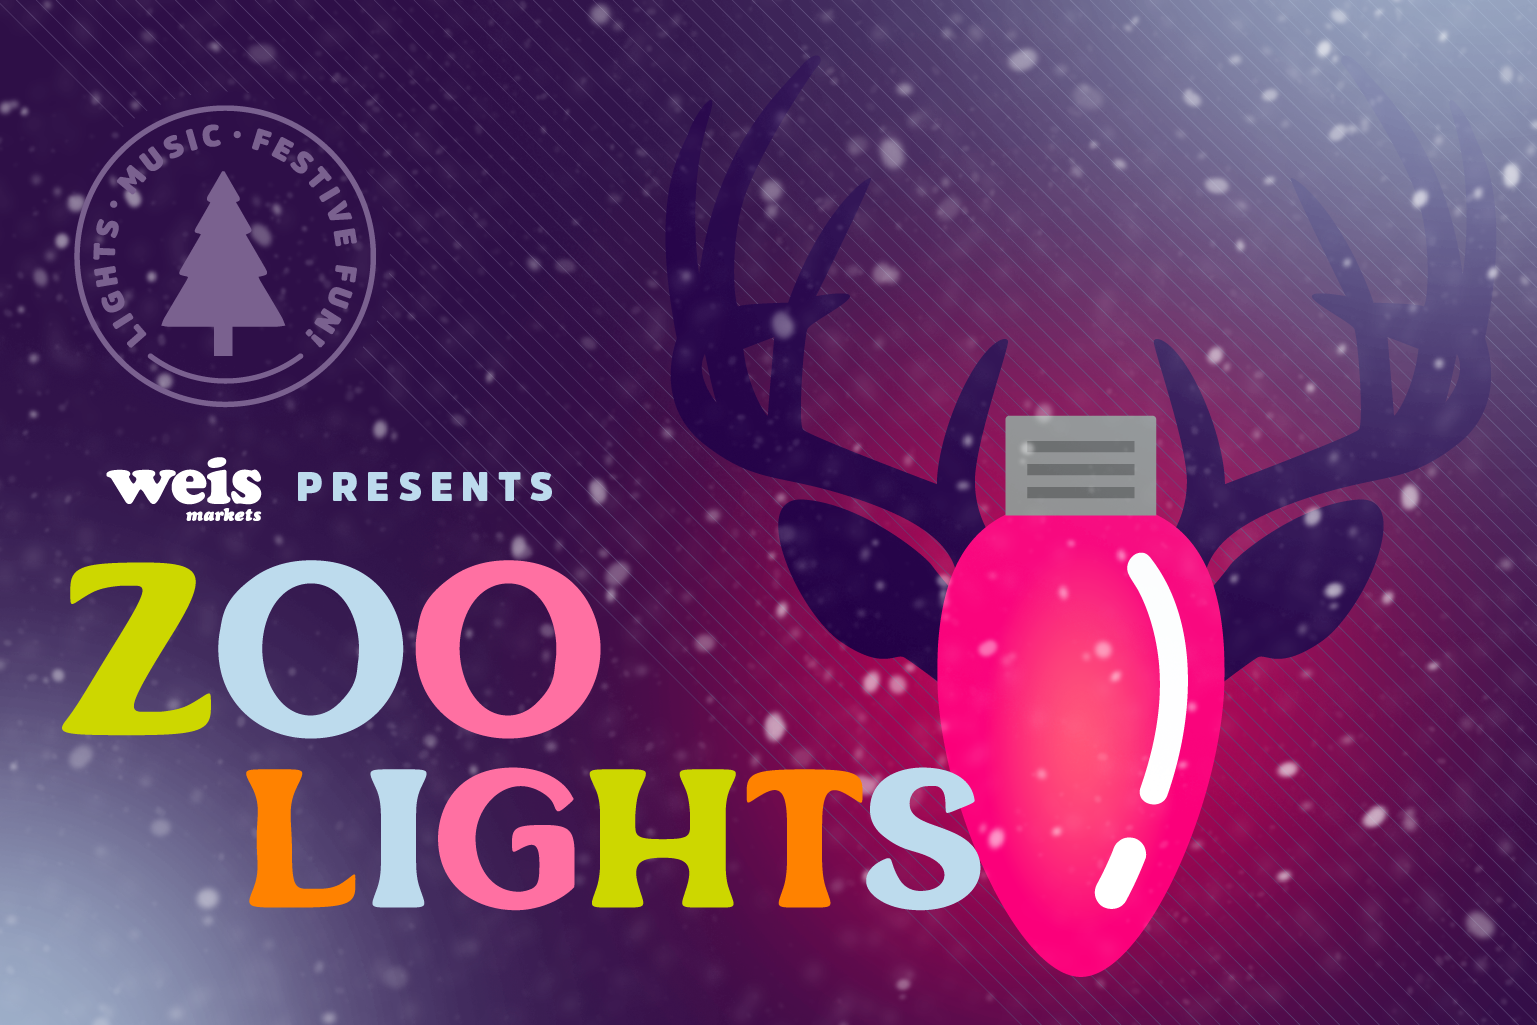 Weis Markets presents Zoo Lights